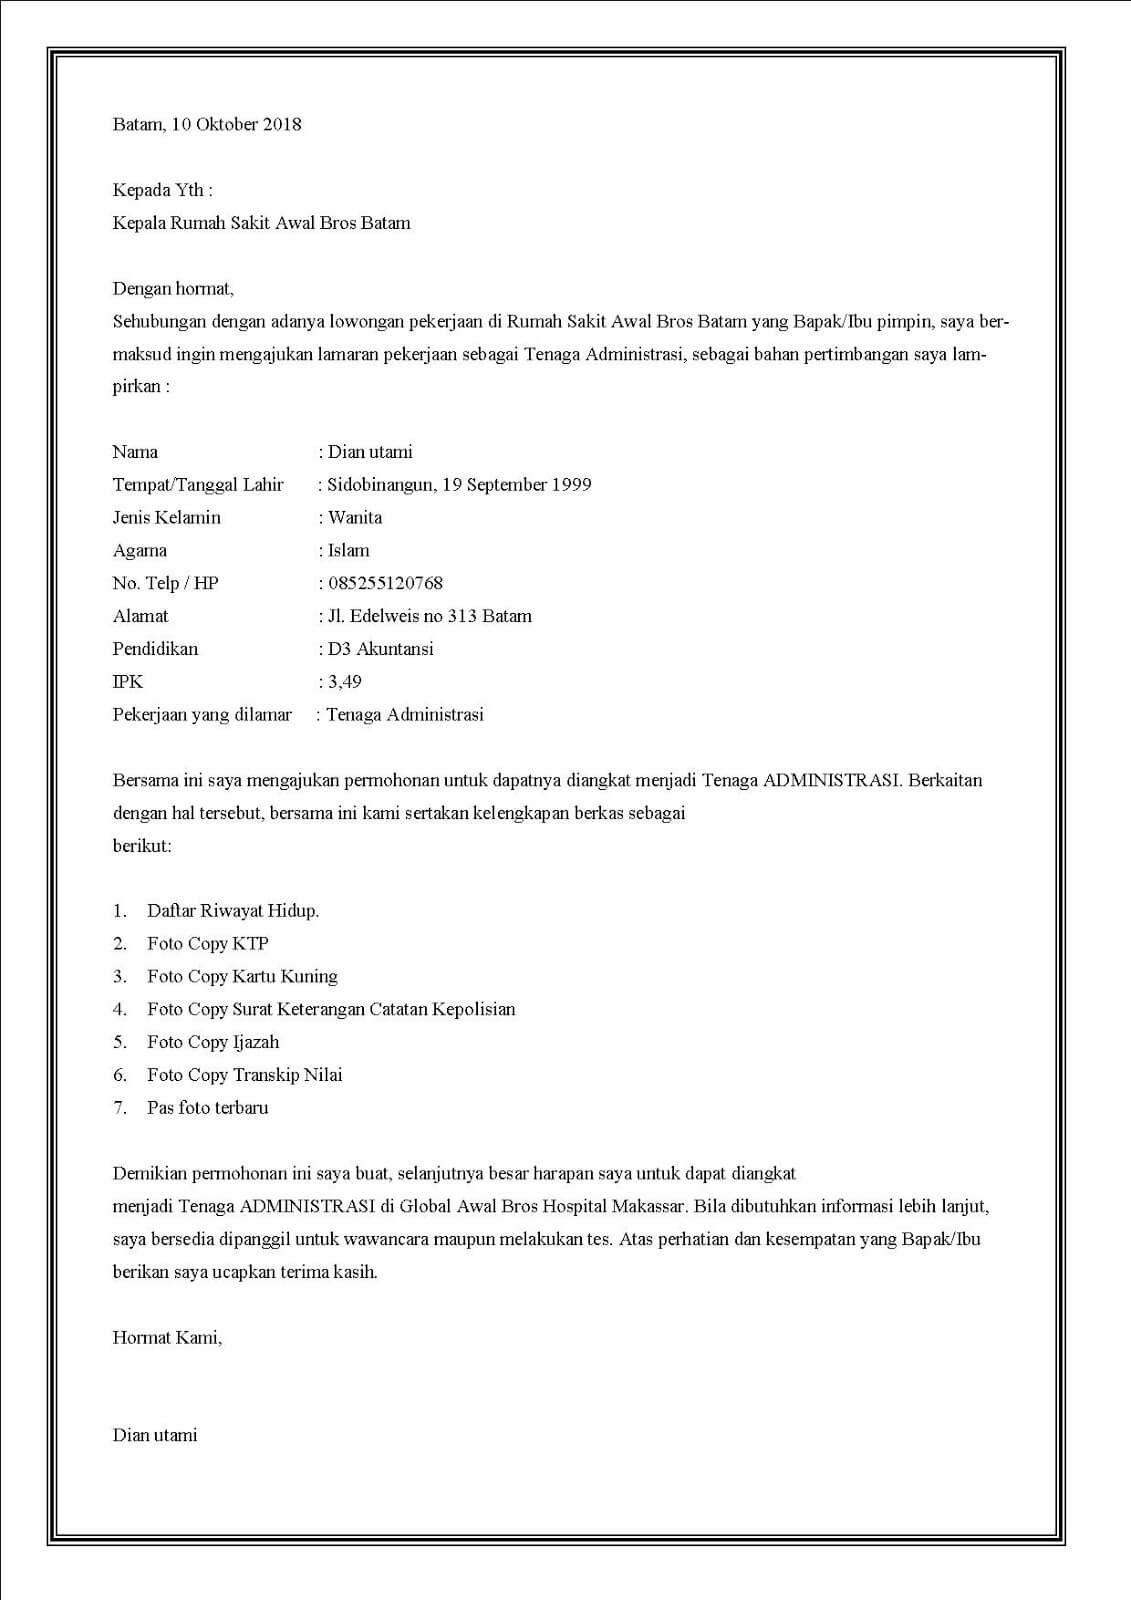 8+ Contoh Surat Lamaran Kerja di Rumah Sakit Paling